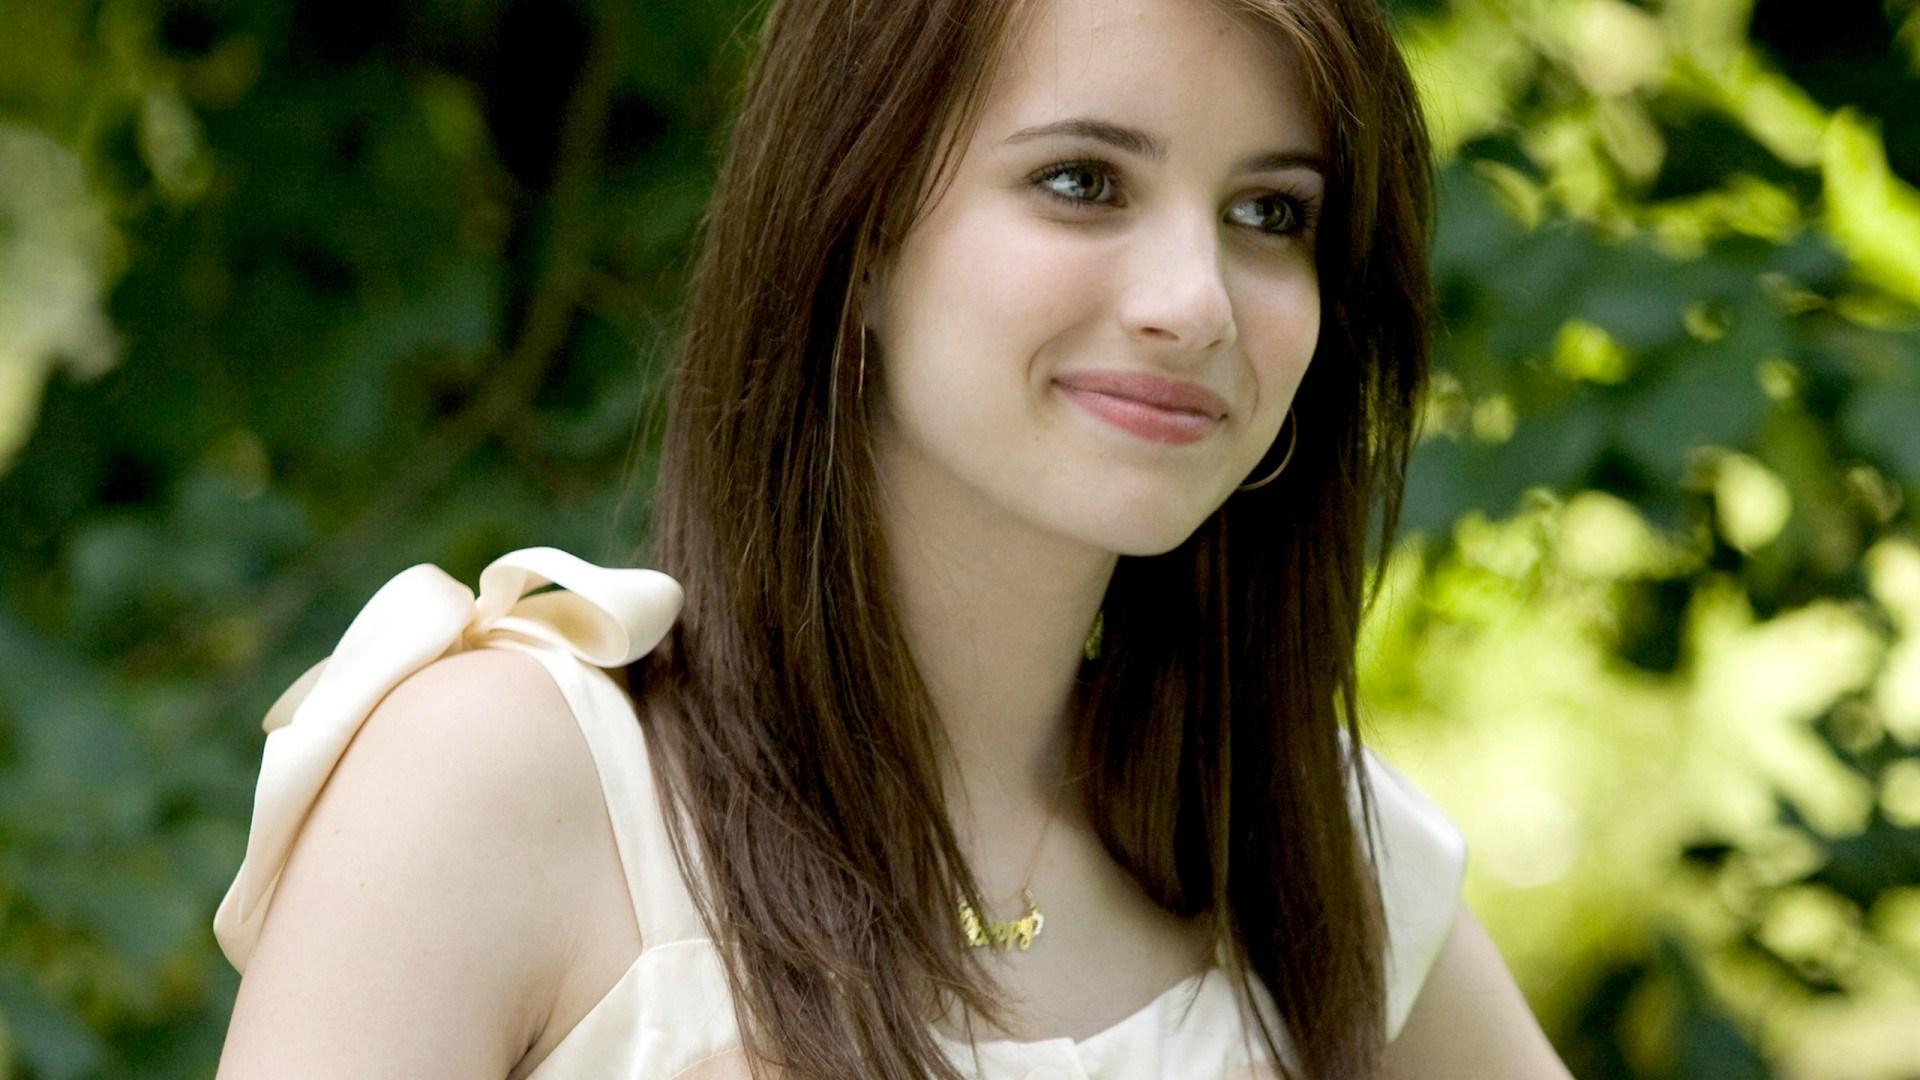 Indian Girl Celebrity Desktop Wallpaper 20998 Source - Tumhe Koi Aur Dekhe To Jalta Hai , HD Wallpaper & Backgrounds